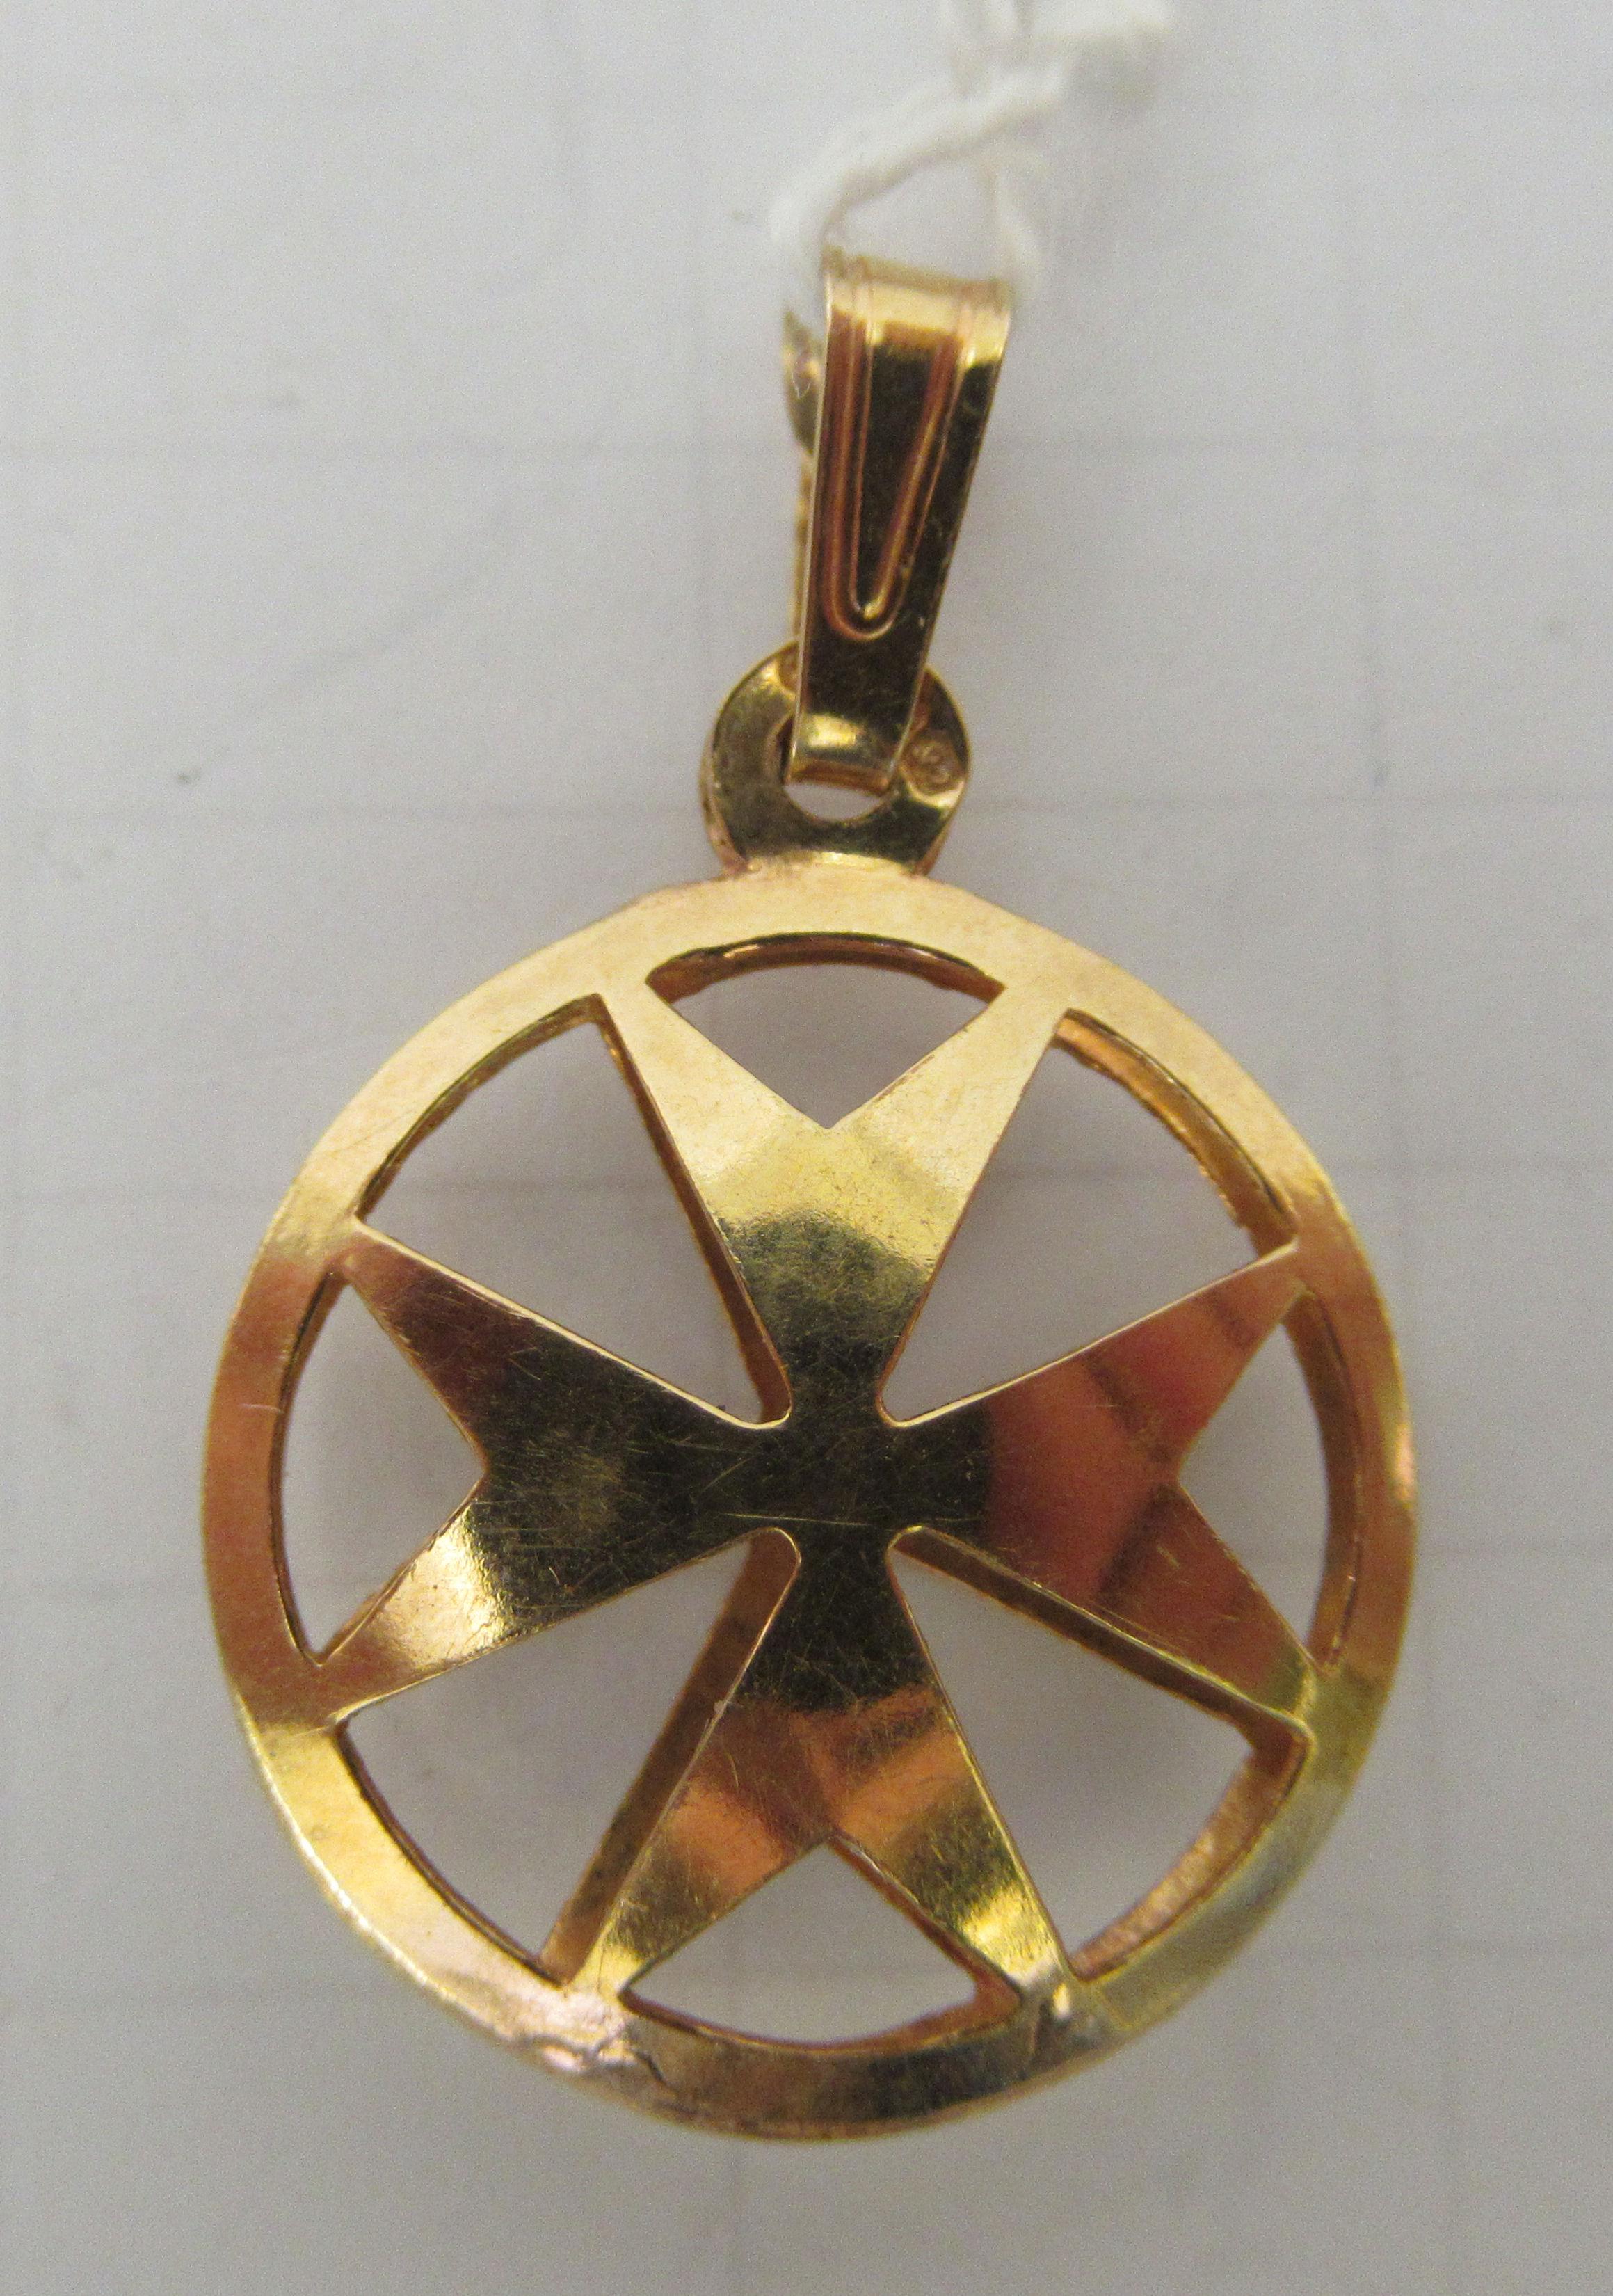 An 18ct gold Maltese cross pendant - Image 2 of 2